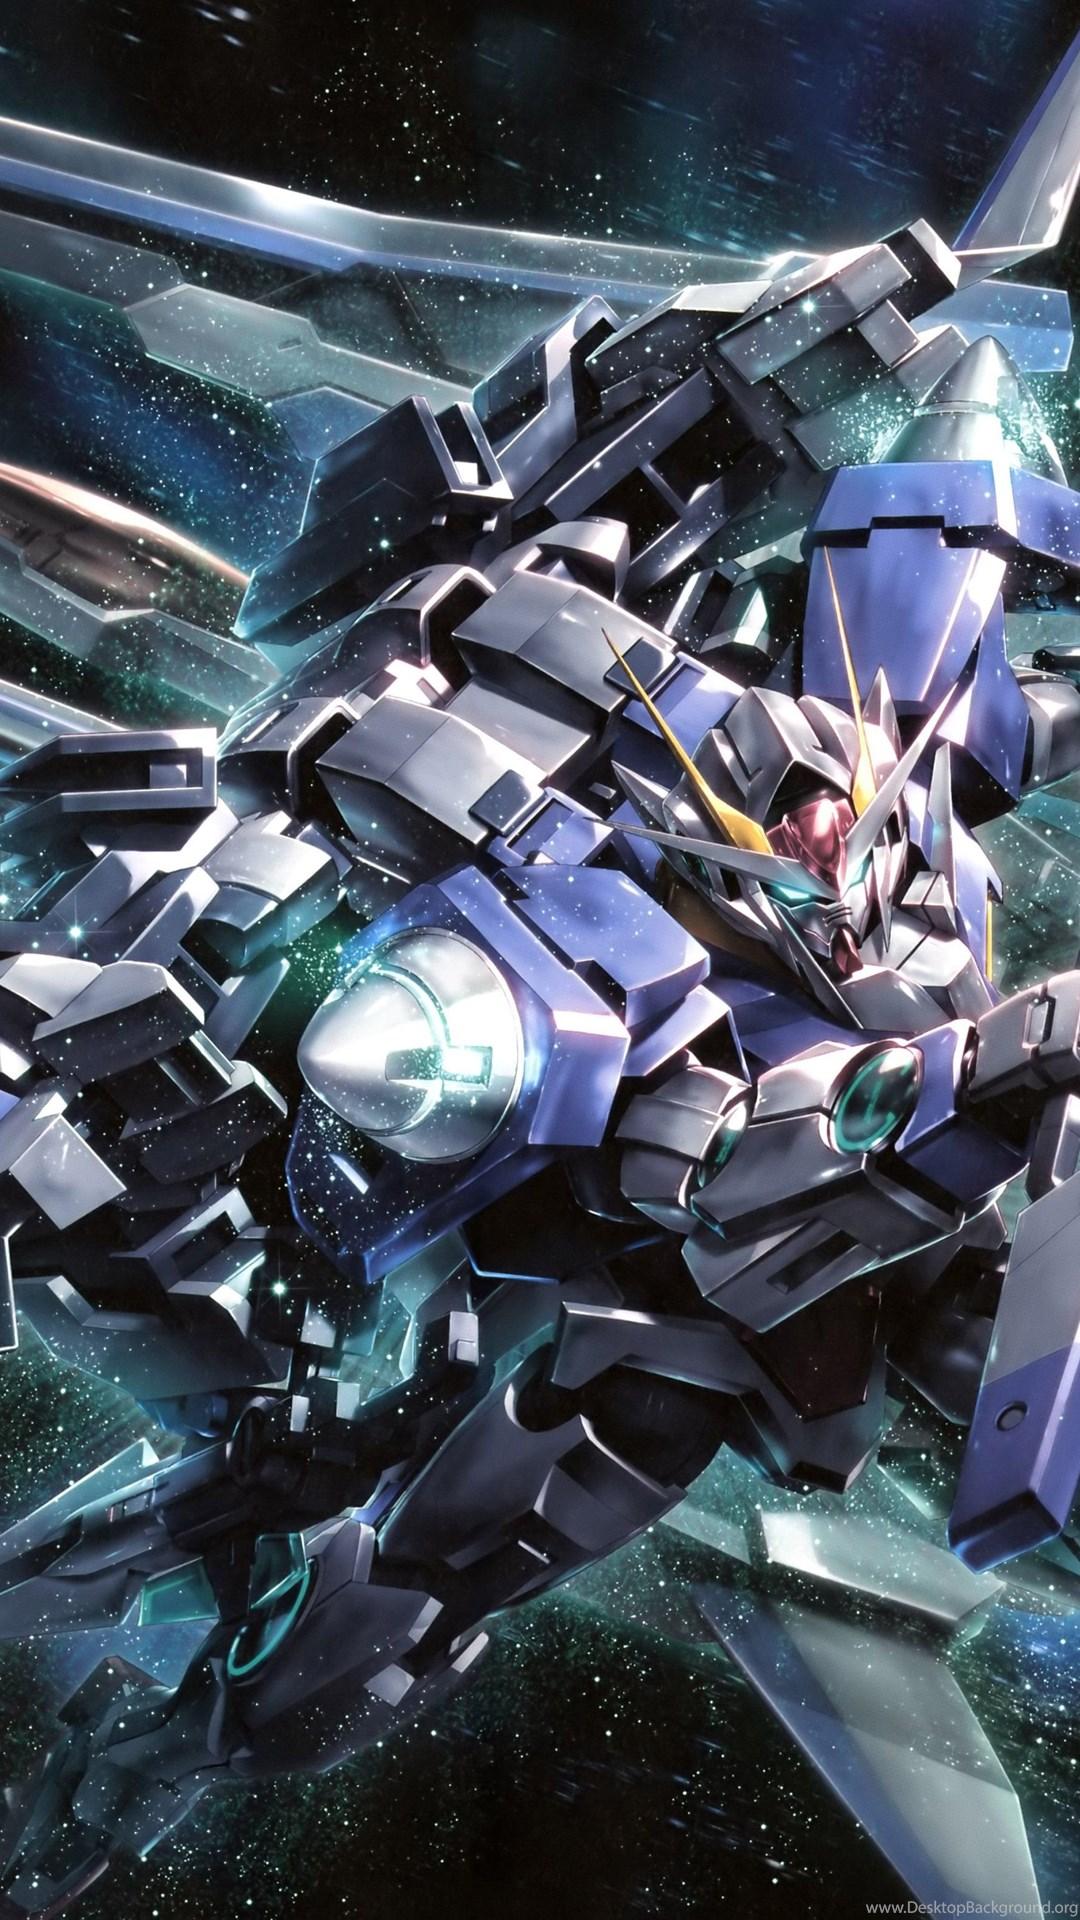 Unduh 600 Wallpaper Android Gundam HD Terbaru